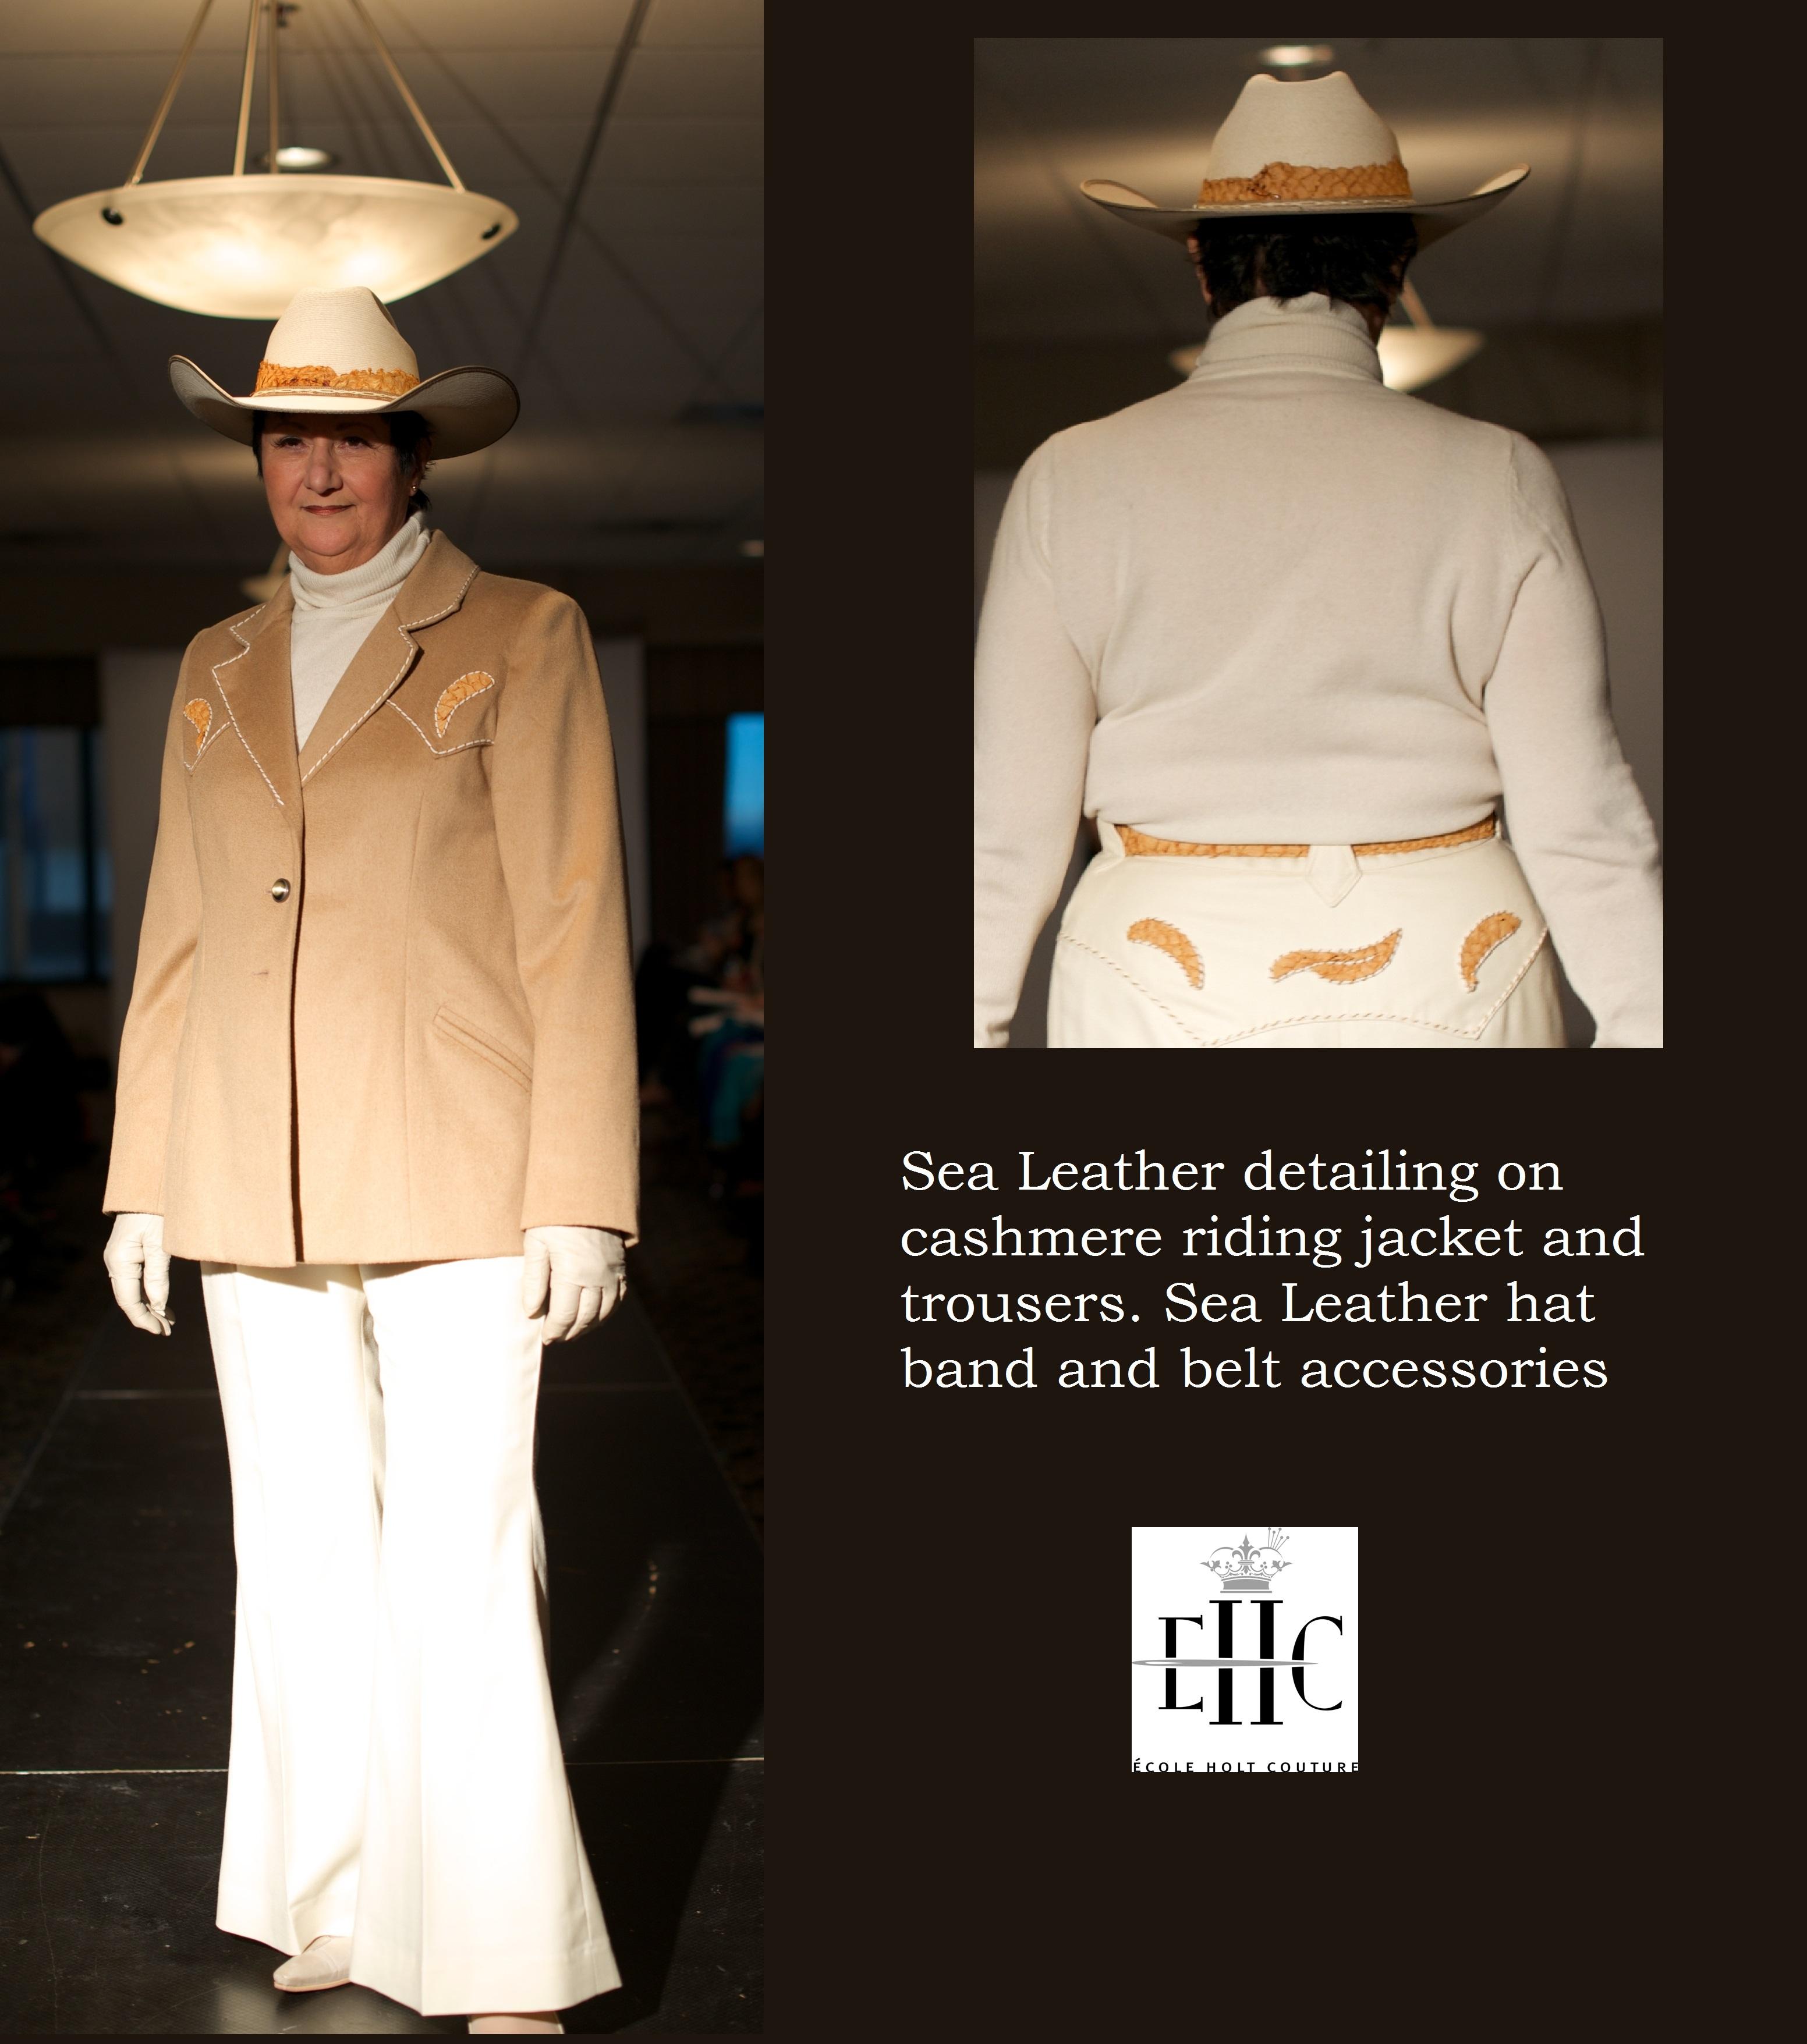 Dress Code 2012 EHC Fashion Event